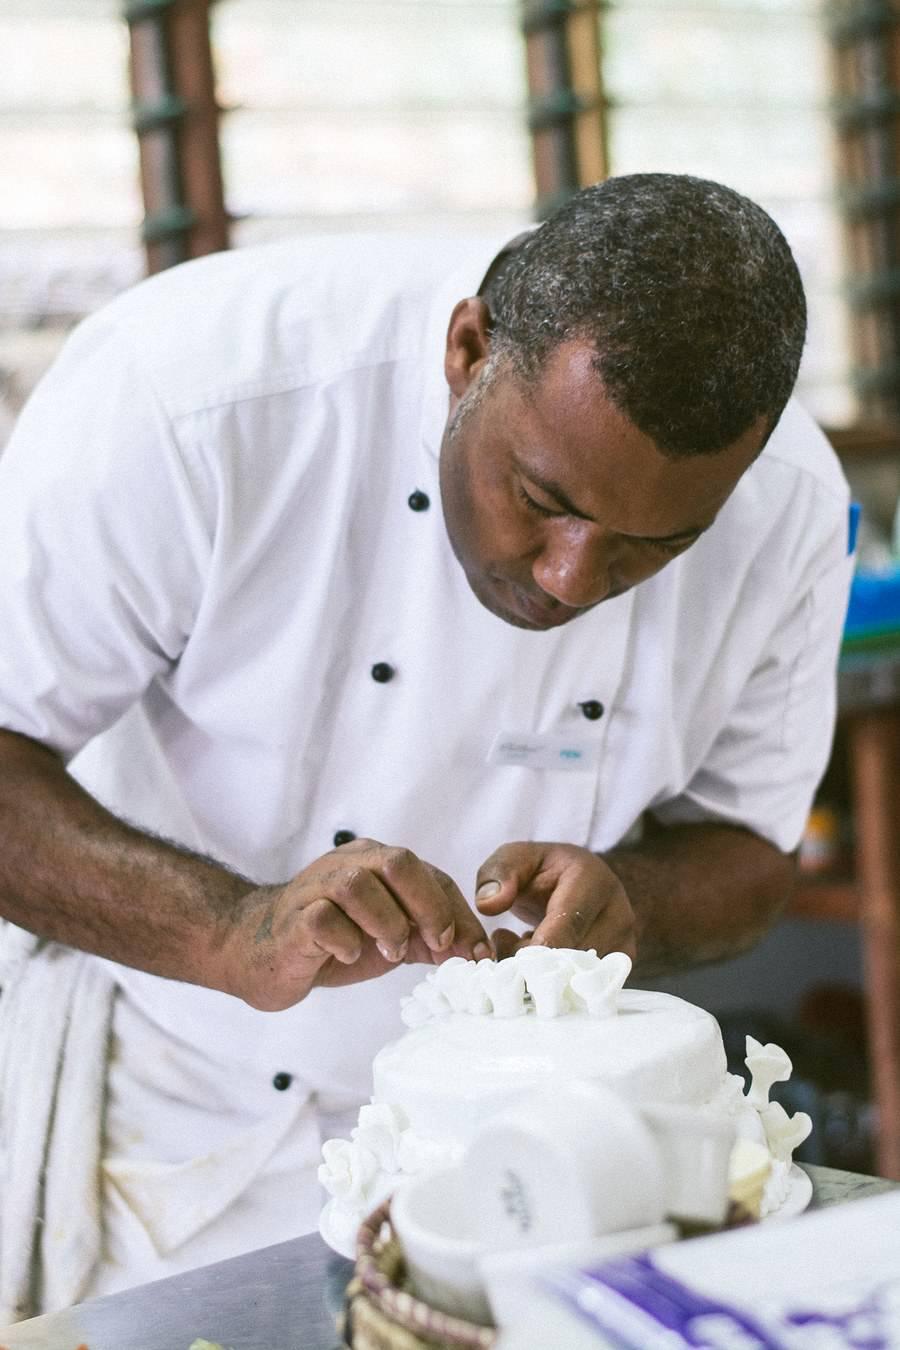 Fiji Wedding Cake - Fiji Beach Wedding Elopement - The Remote Resort Fiji Islands